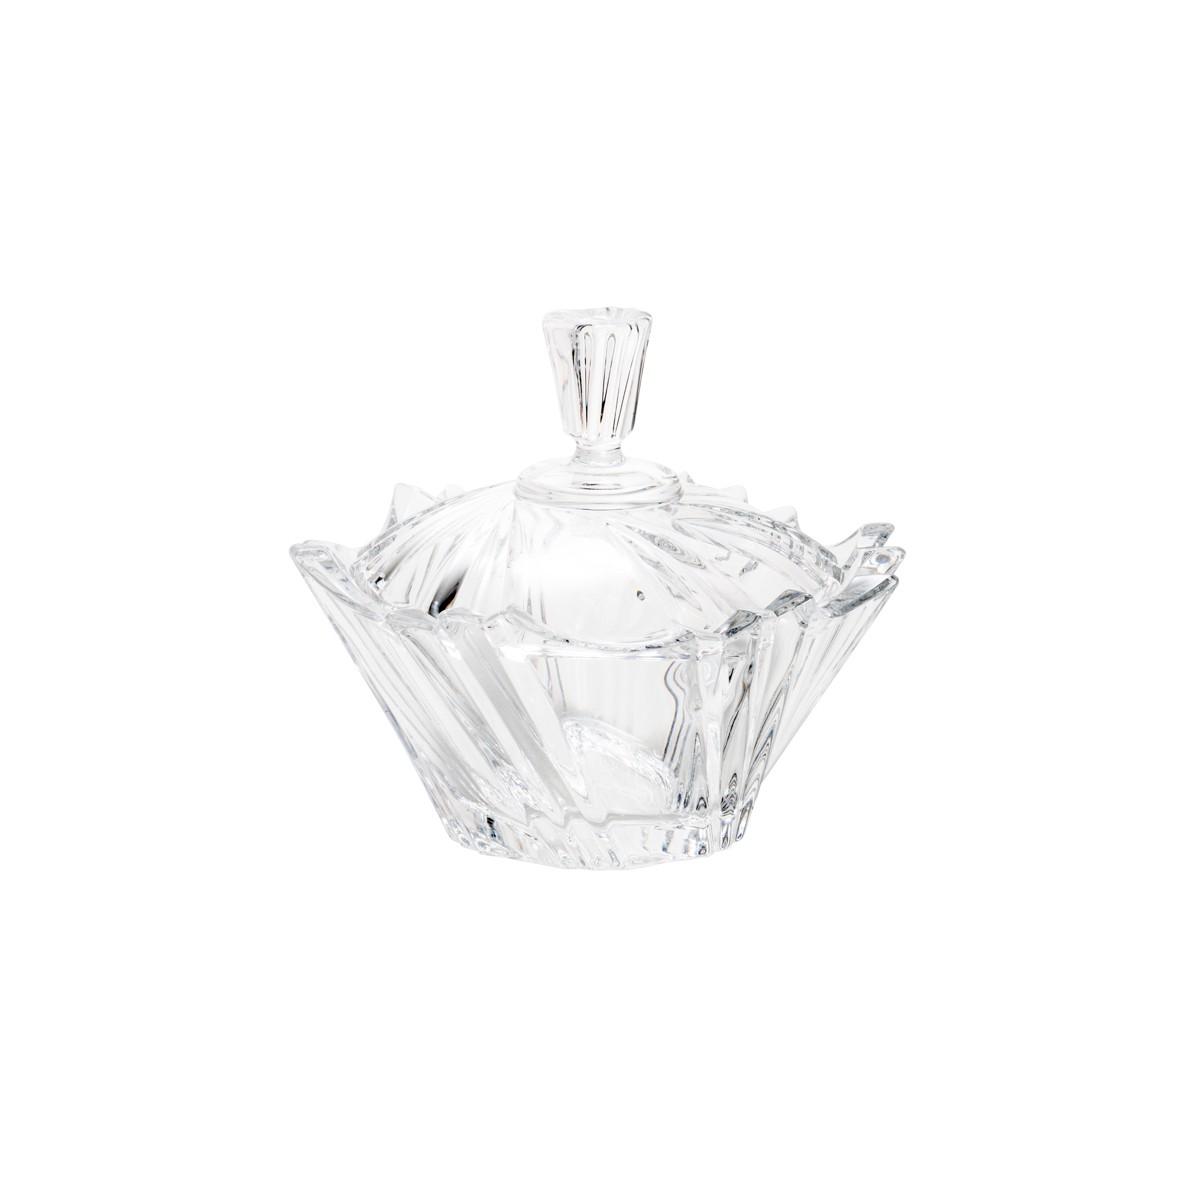 Bomboniere de Cristal com Tampa Ikaro Bohemia 13cm